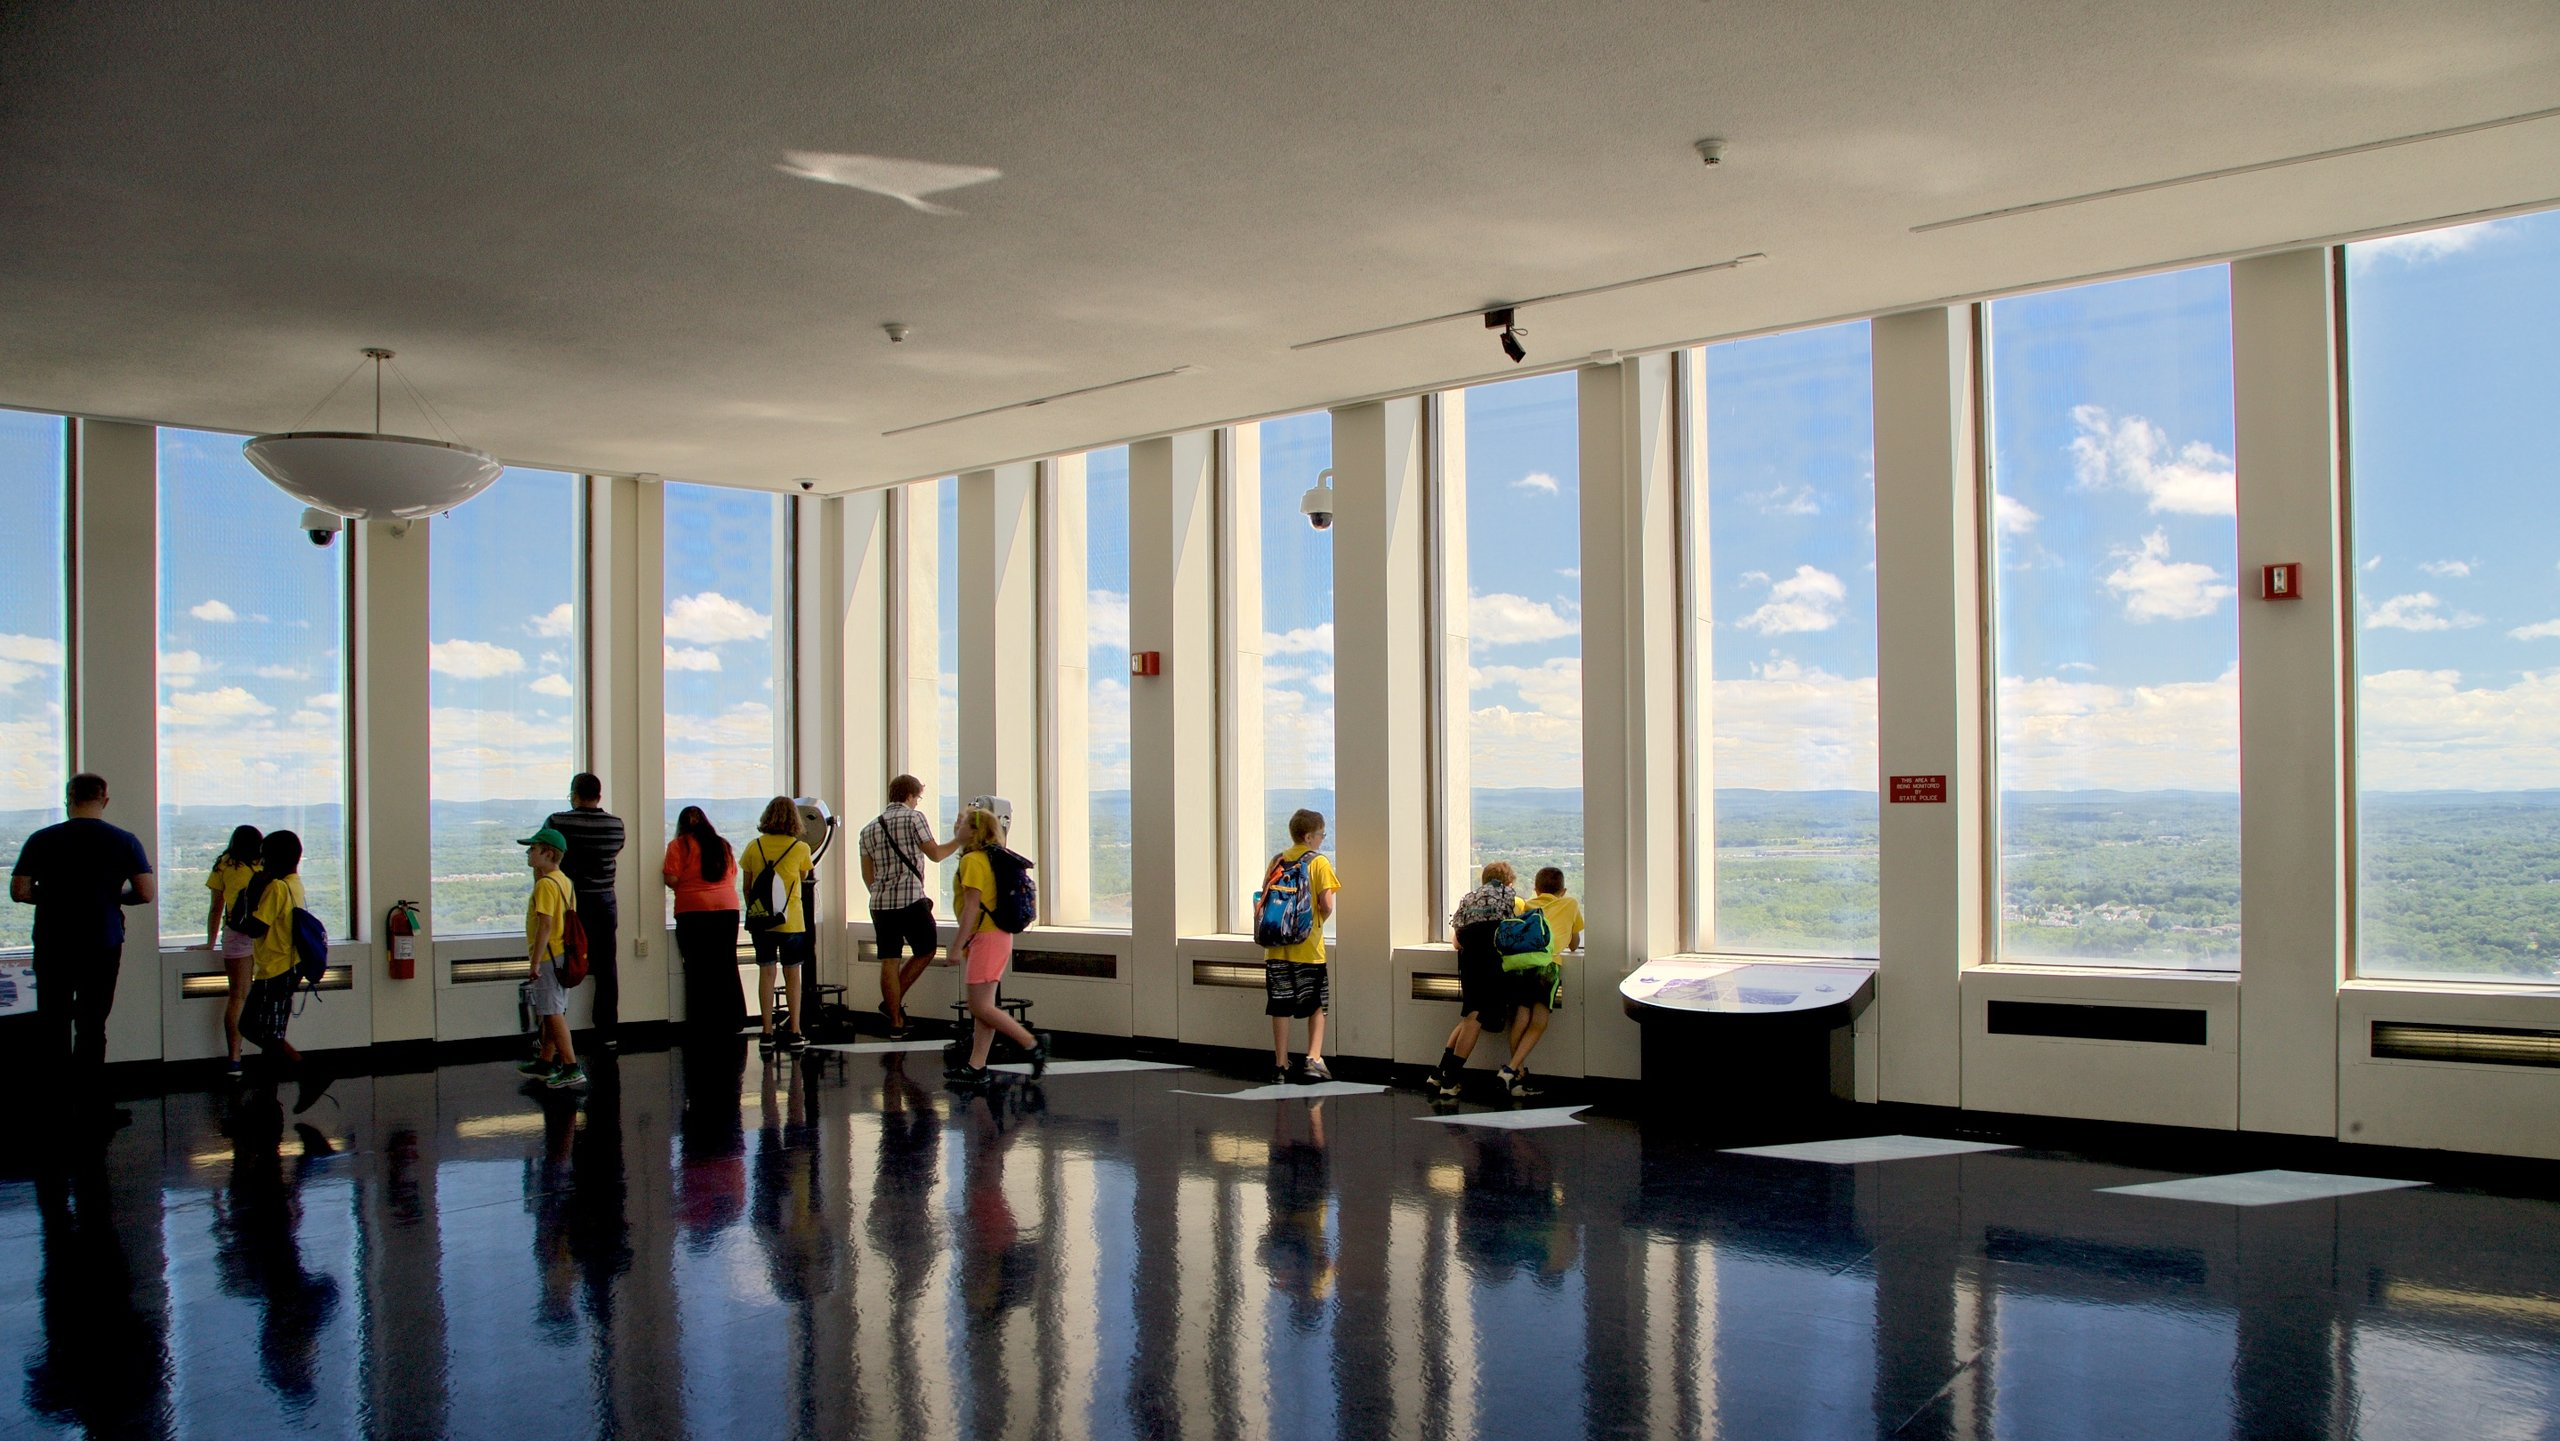 Corning Tower, Albany, New York, USA